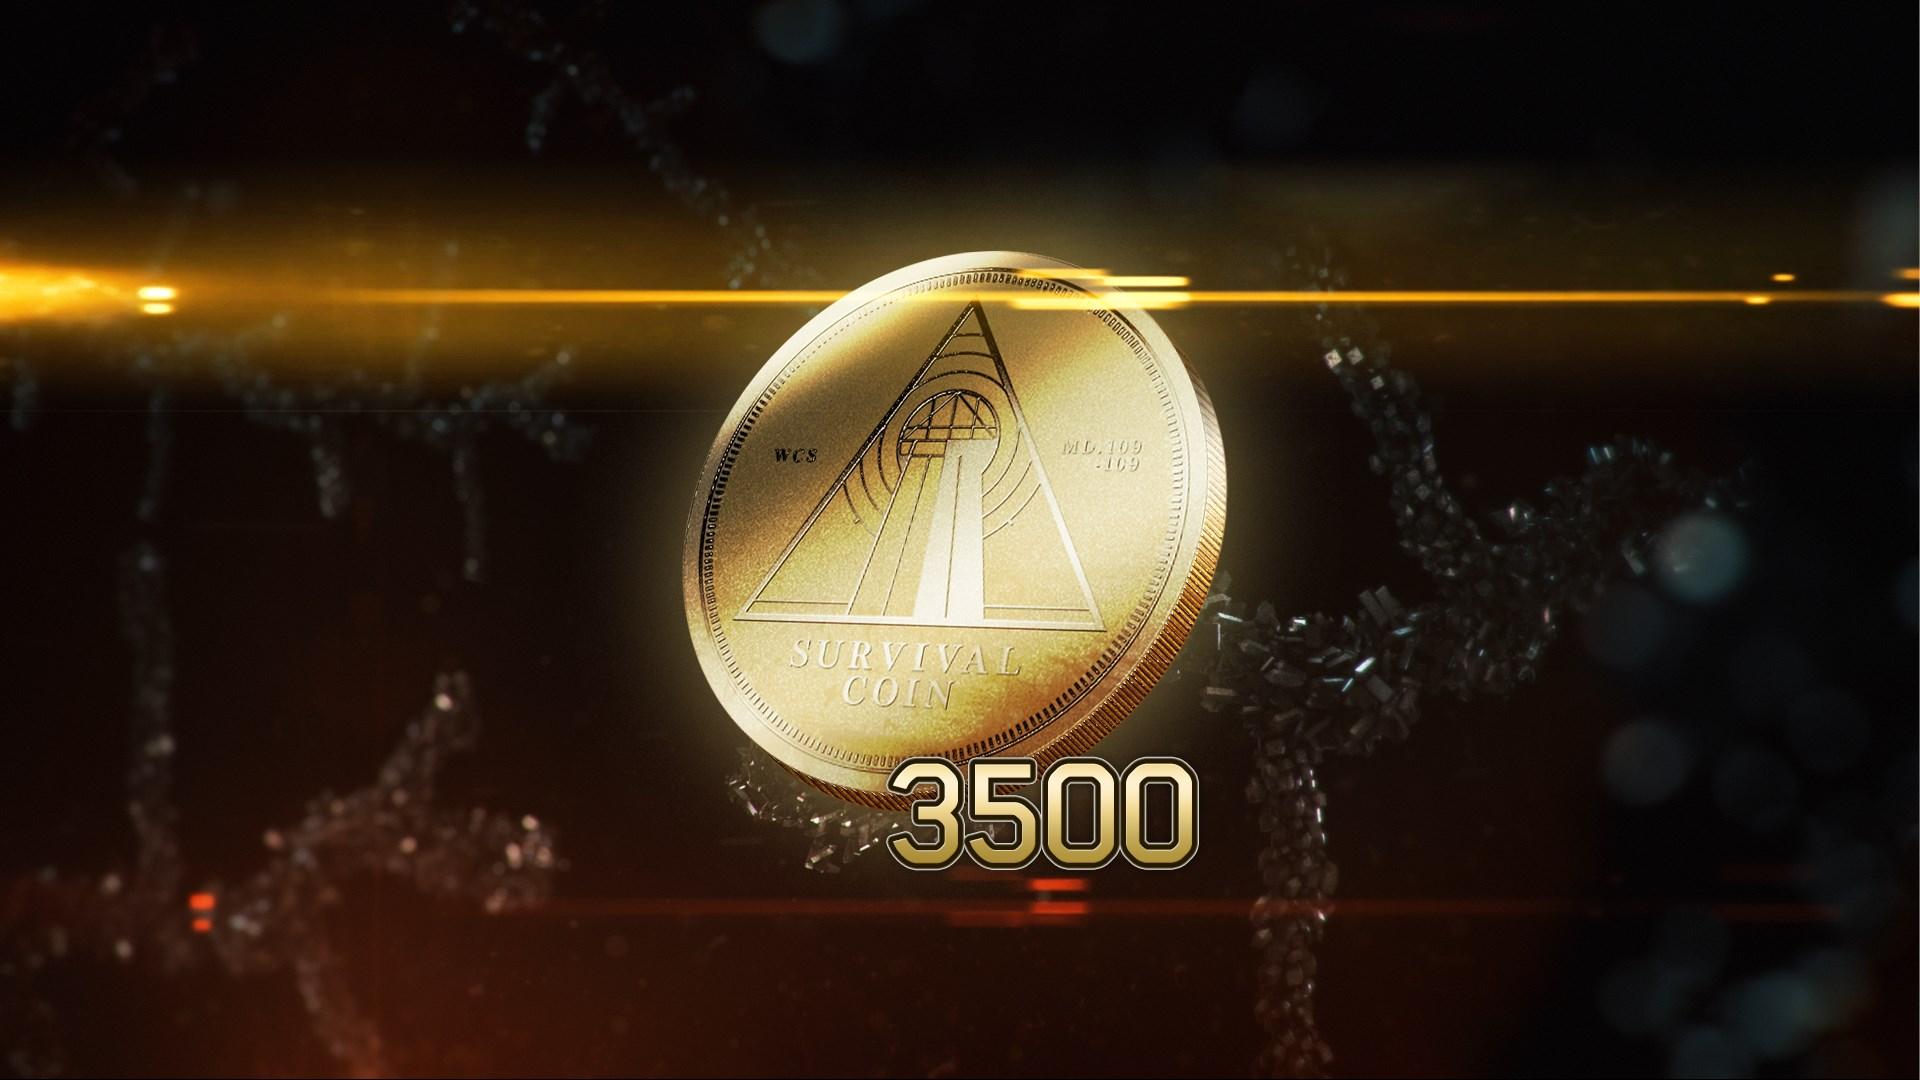 3500 SV Coins